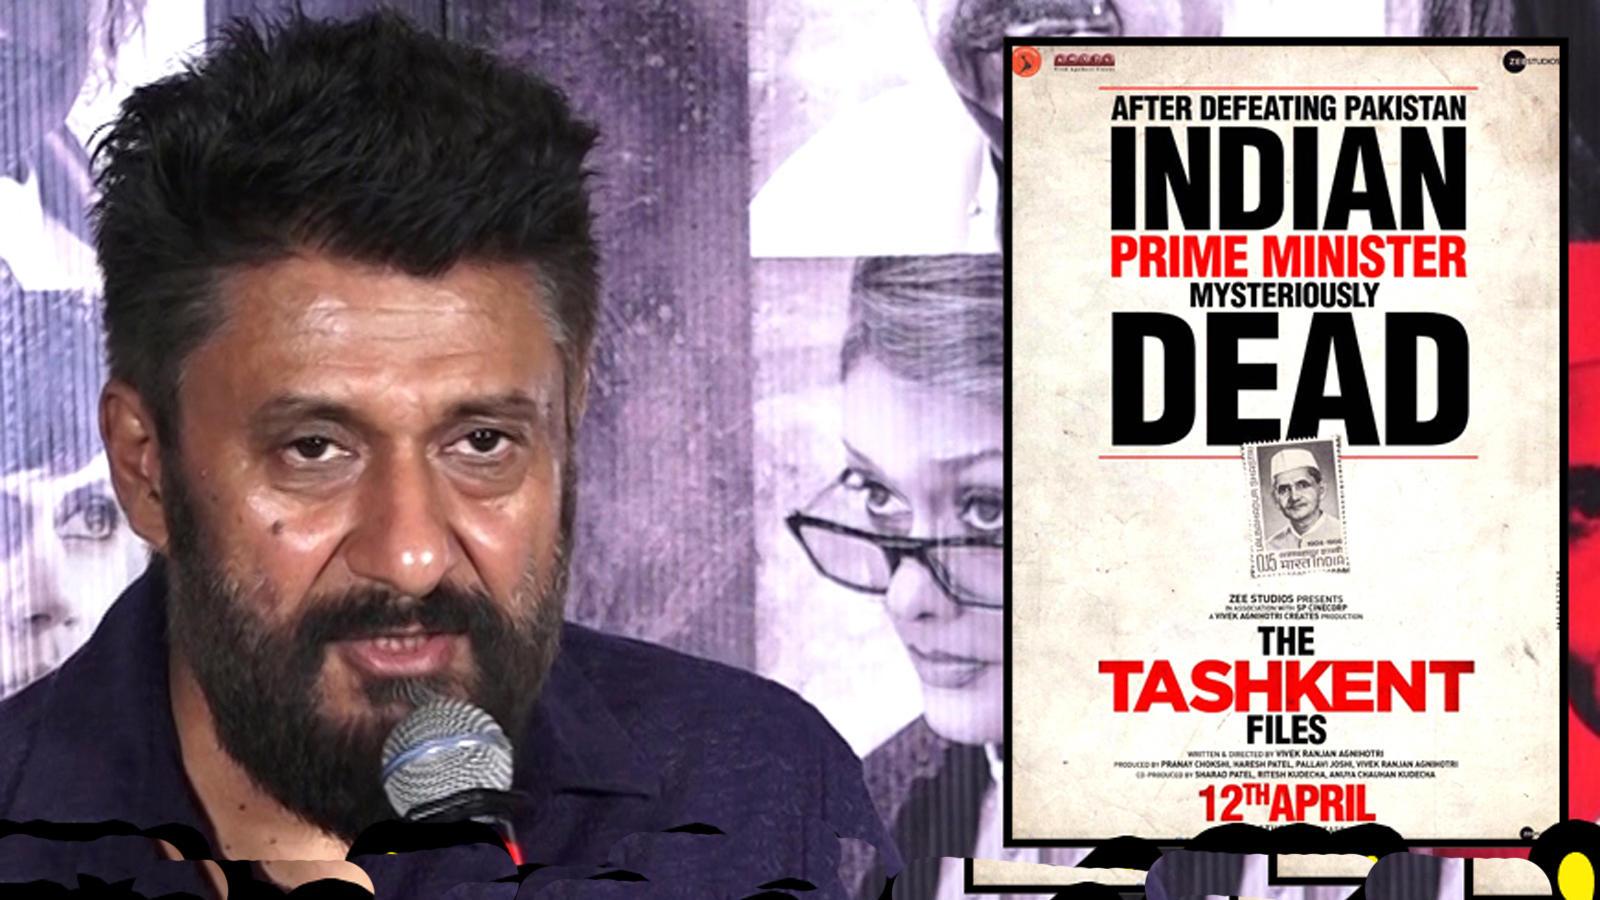 'The Tashkent files' dedicated to journalists of India, says filmmaker Vivek Agnihotri